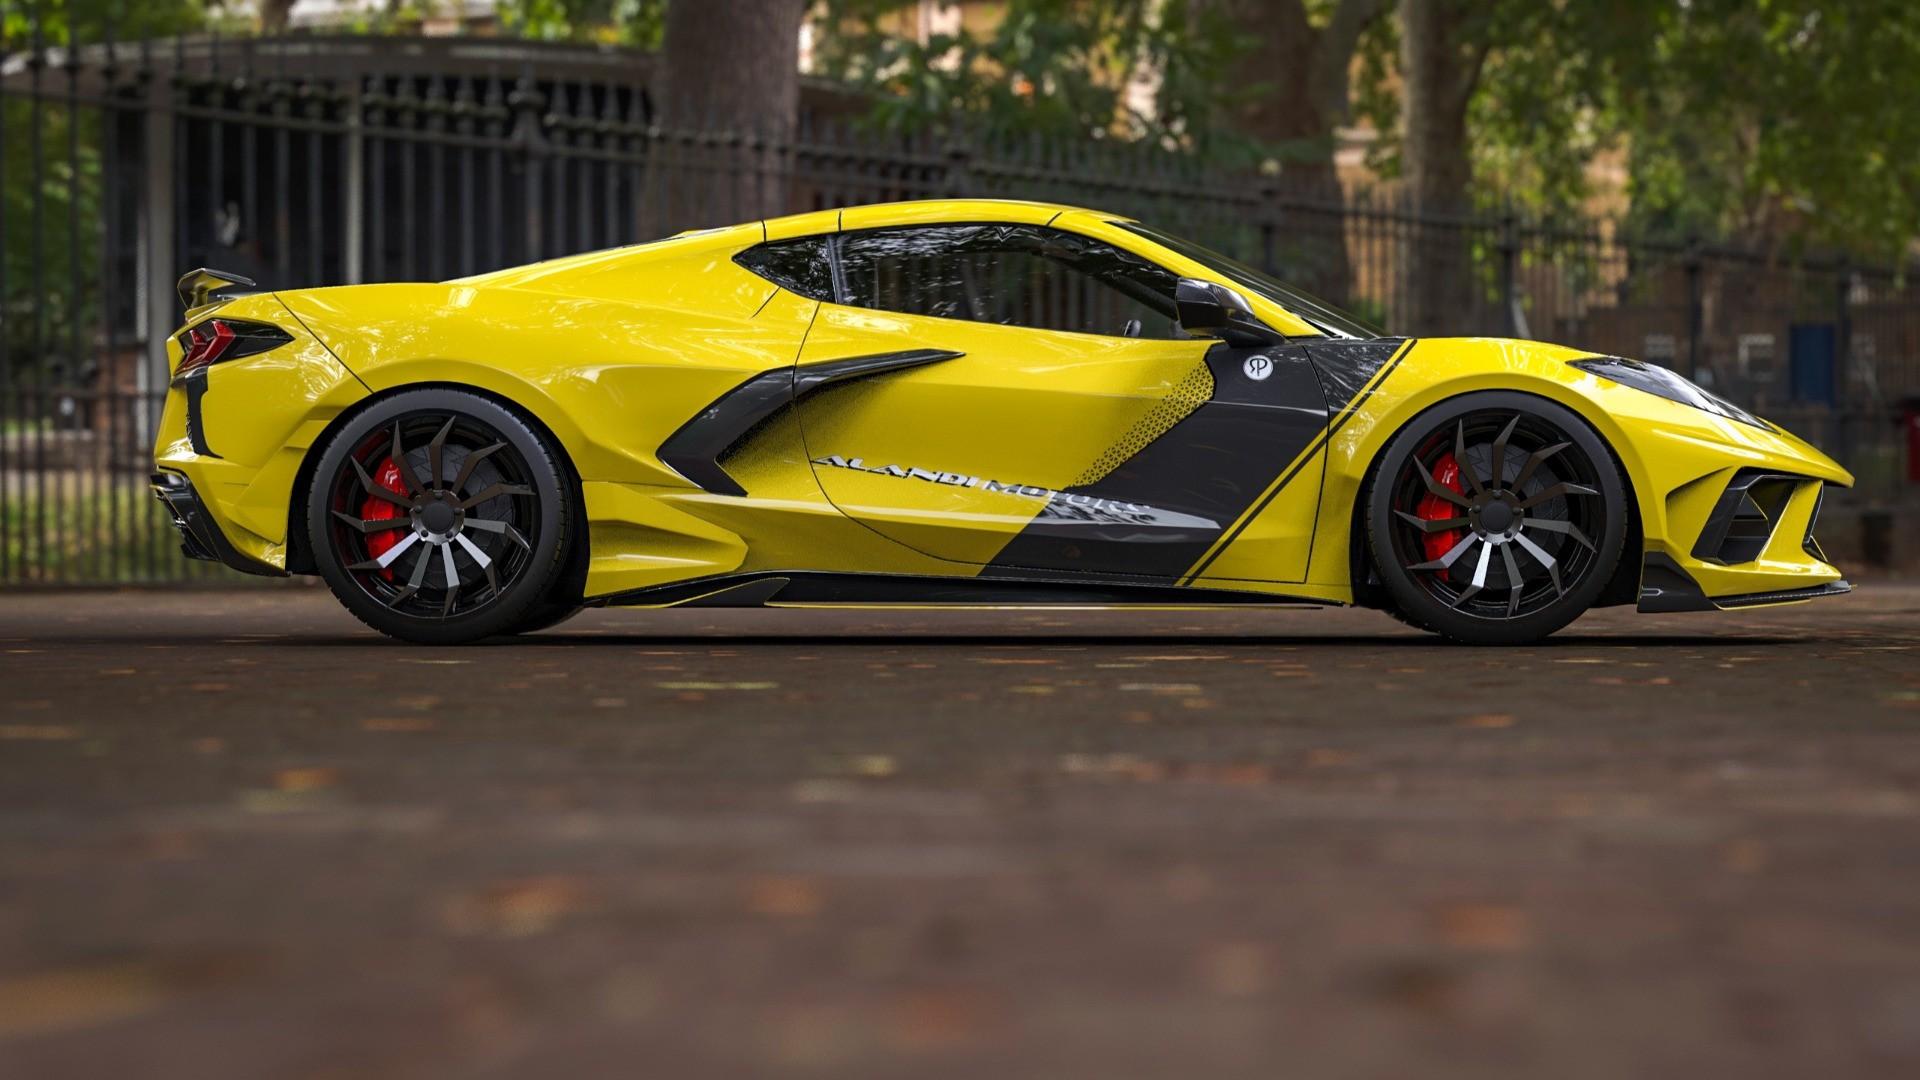 Chevrolet-Corvette-Centurion-by-Alandi-Motors-4